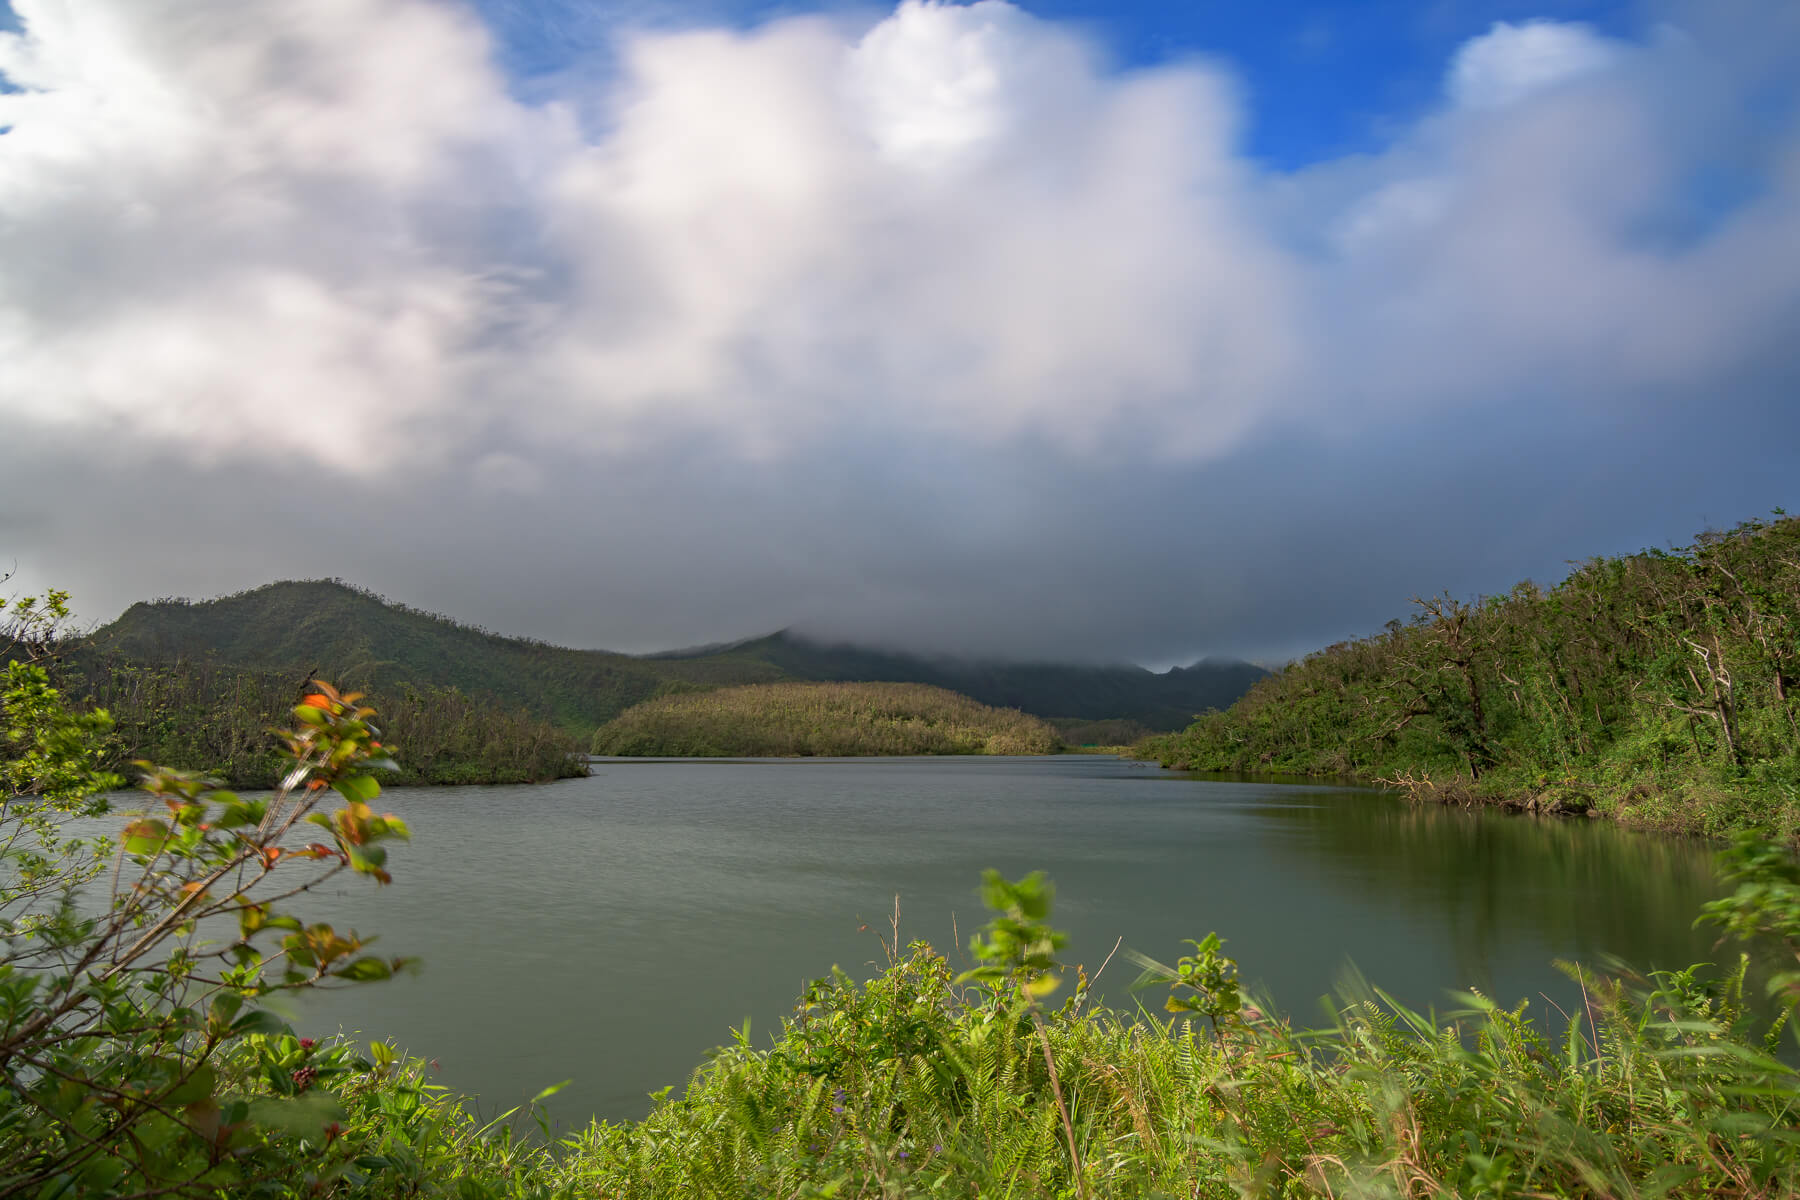 Cloudy skies at Freshwater Lake.